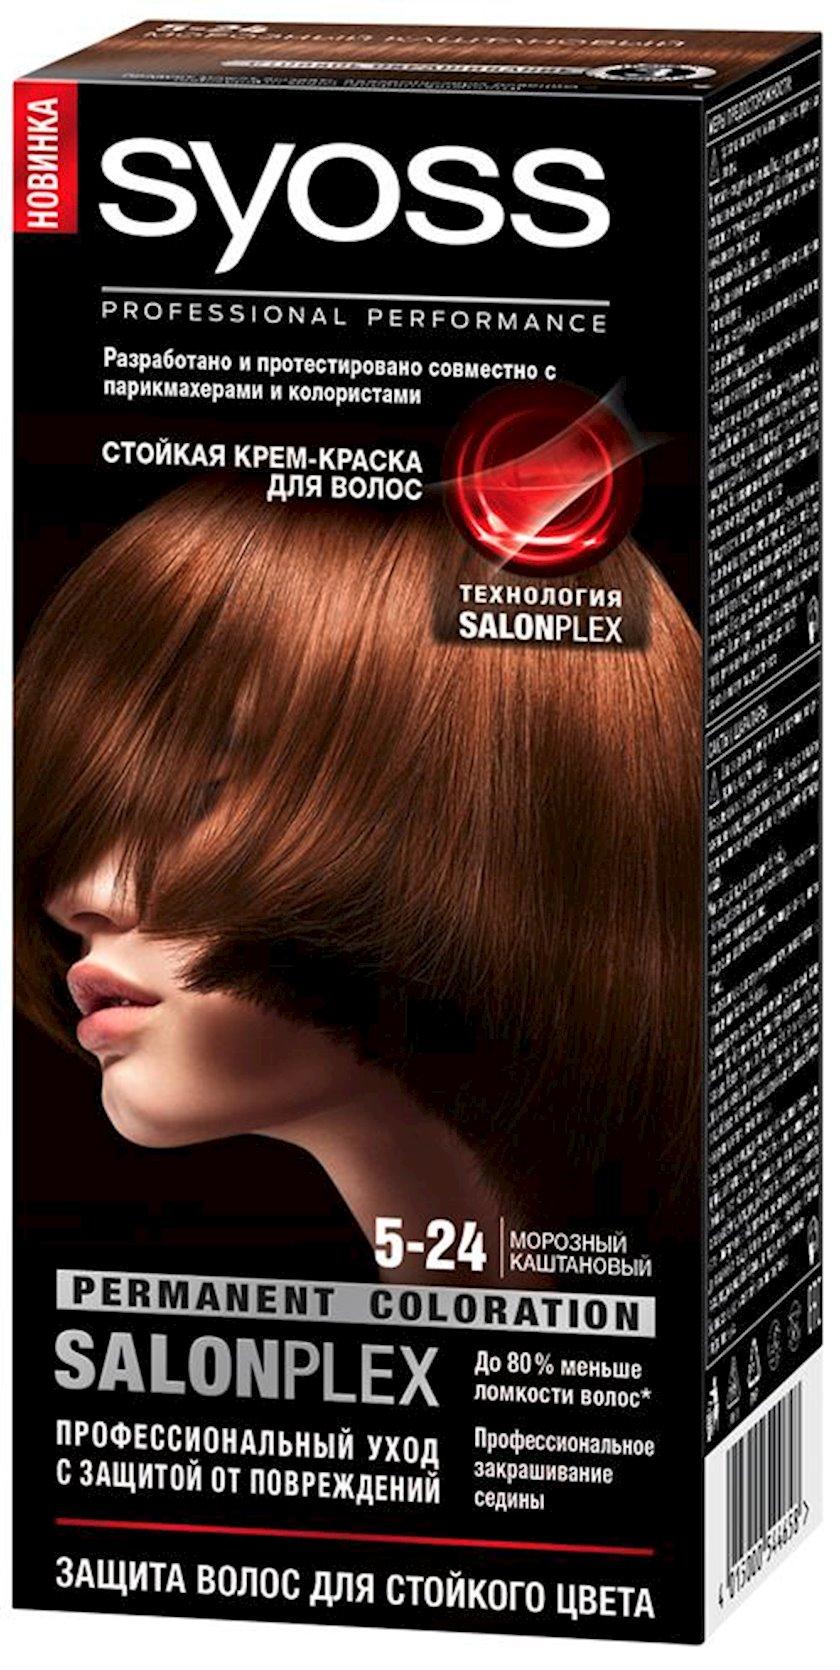 Saç boyası Syoss 5-24 Şaxtalı şabalıdı